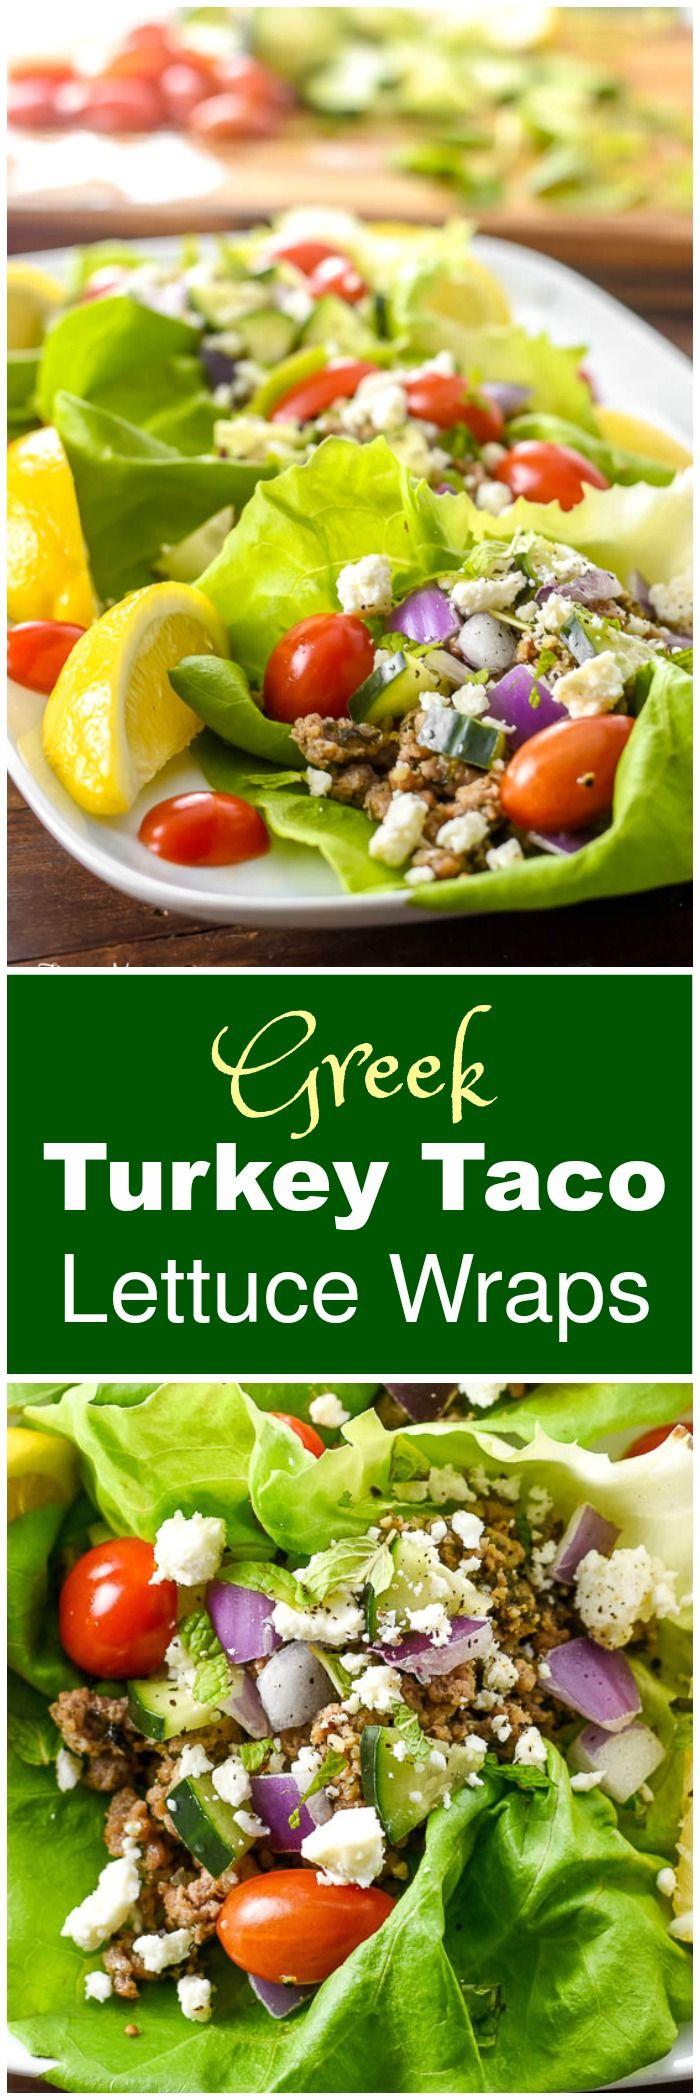 turkey taco lettuce wraps lettuce wraps forward greek turkey taco ...